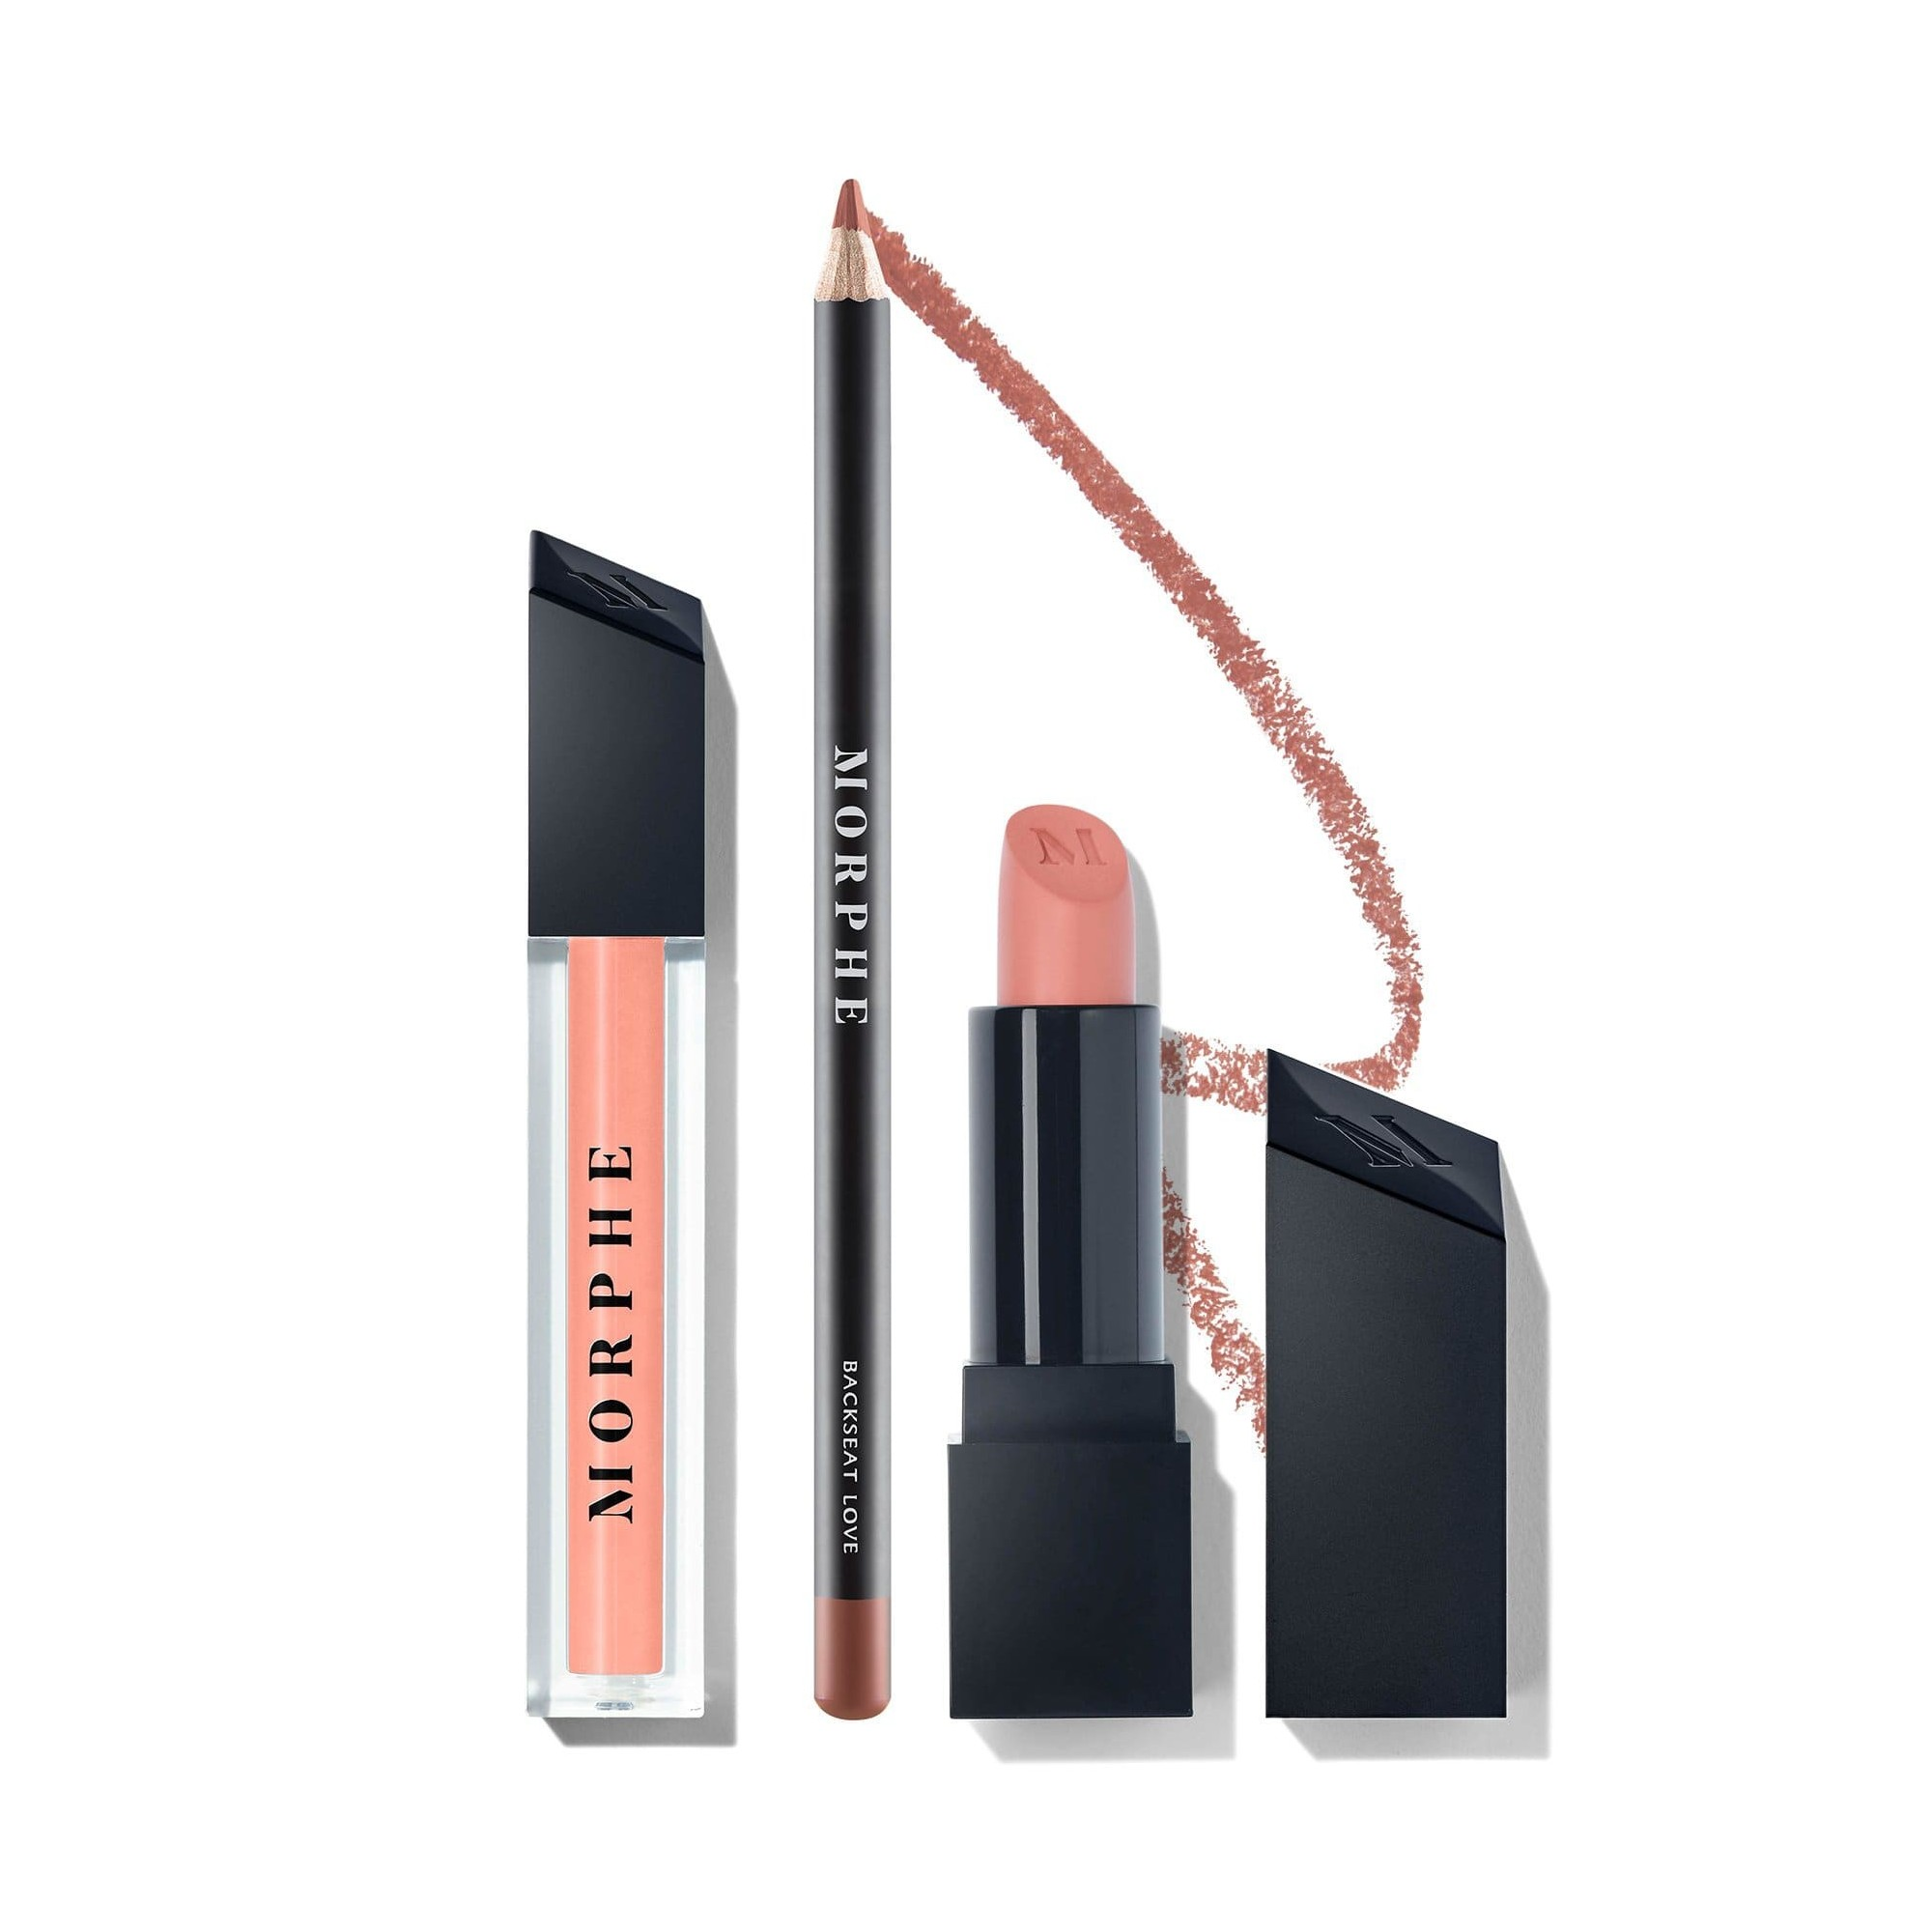 Morphe Nude Pink Lip Trio